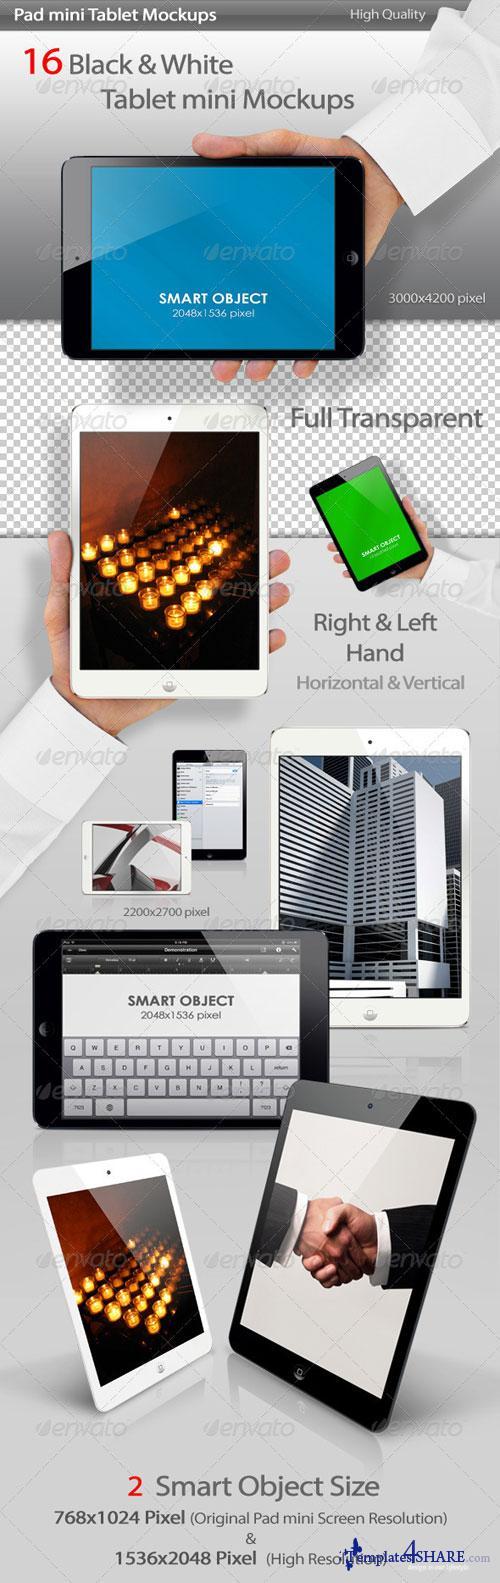 GraphicRiver Pad mini Tablet Mockups